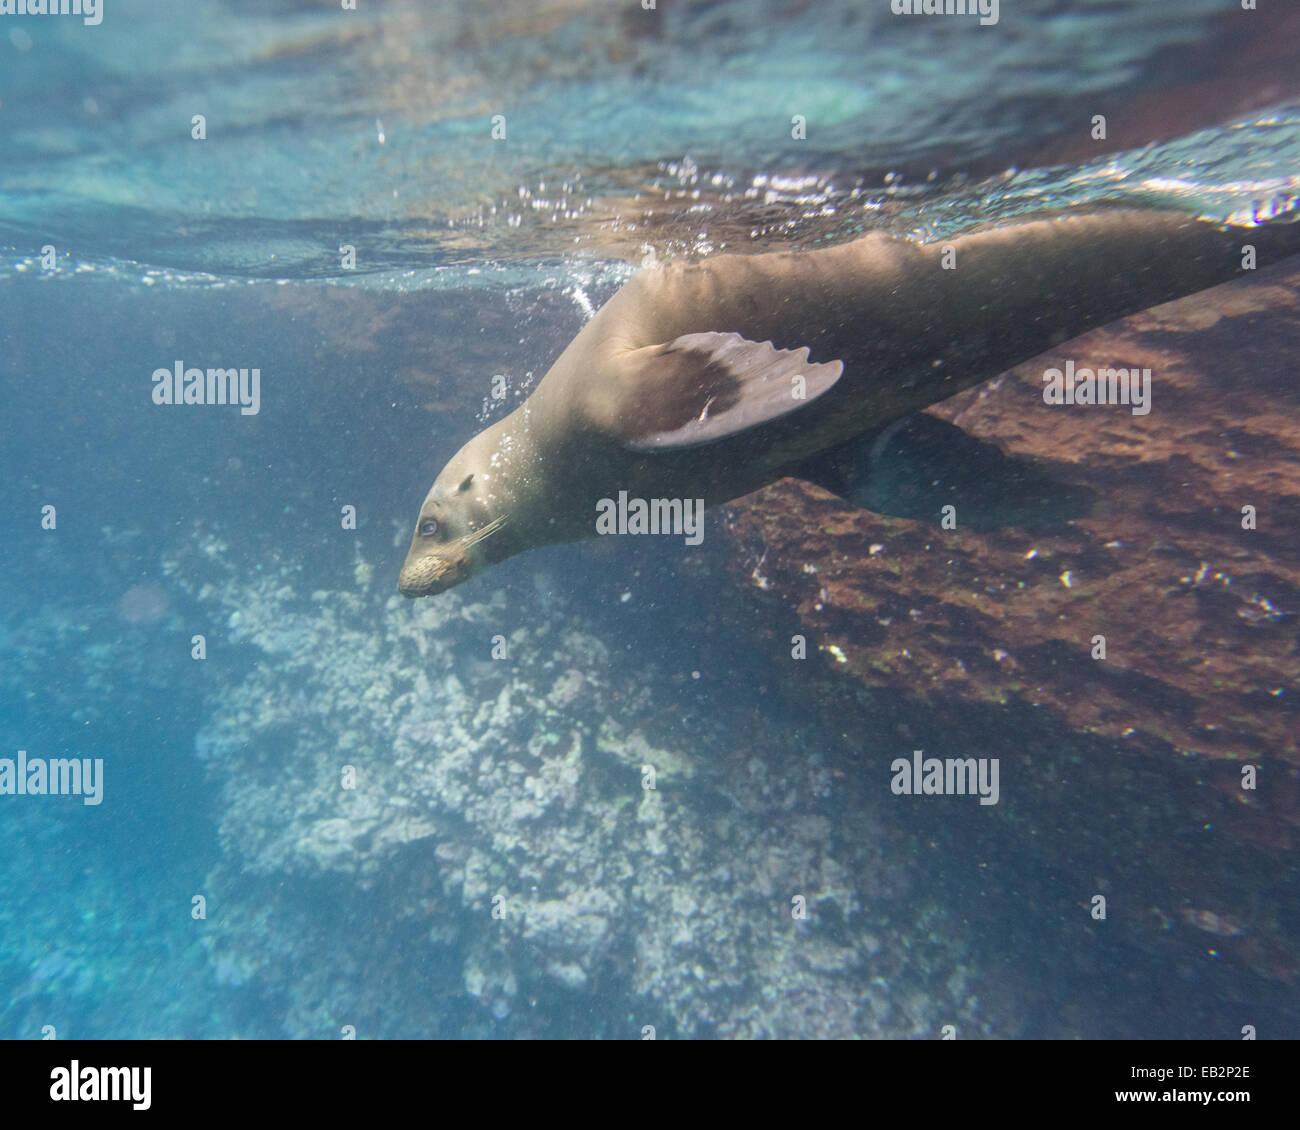 Galapagos Sea Lion (Zalophus wollebaeki) under water, Española Island, Galápagos Islands, Ecuador - Stock Image